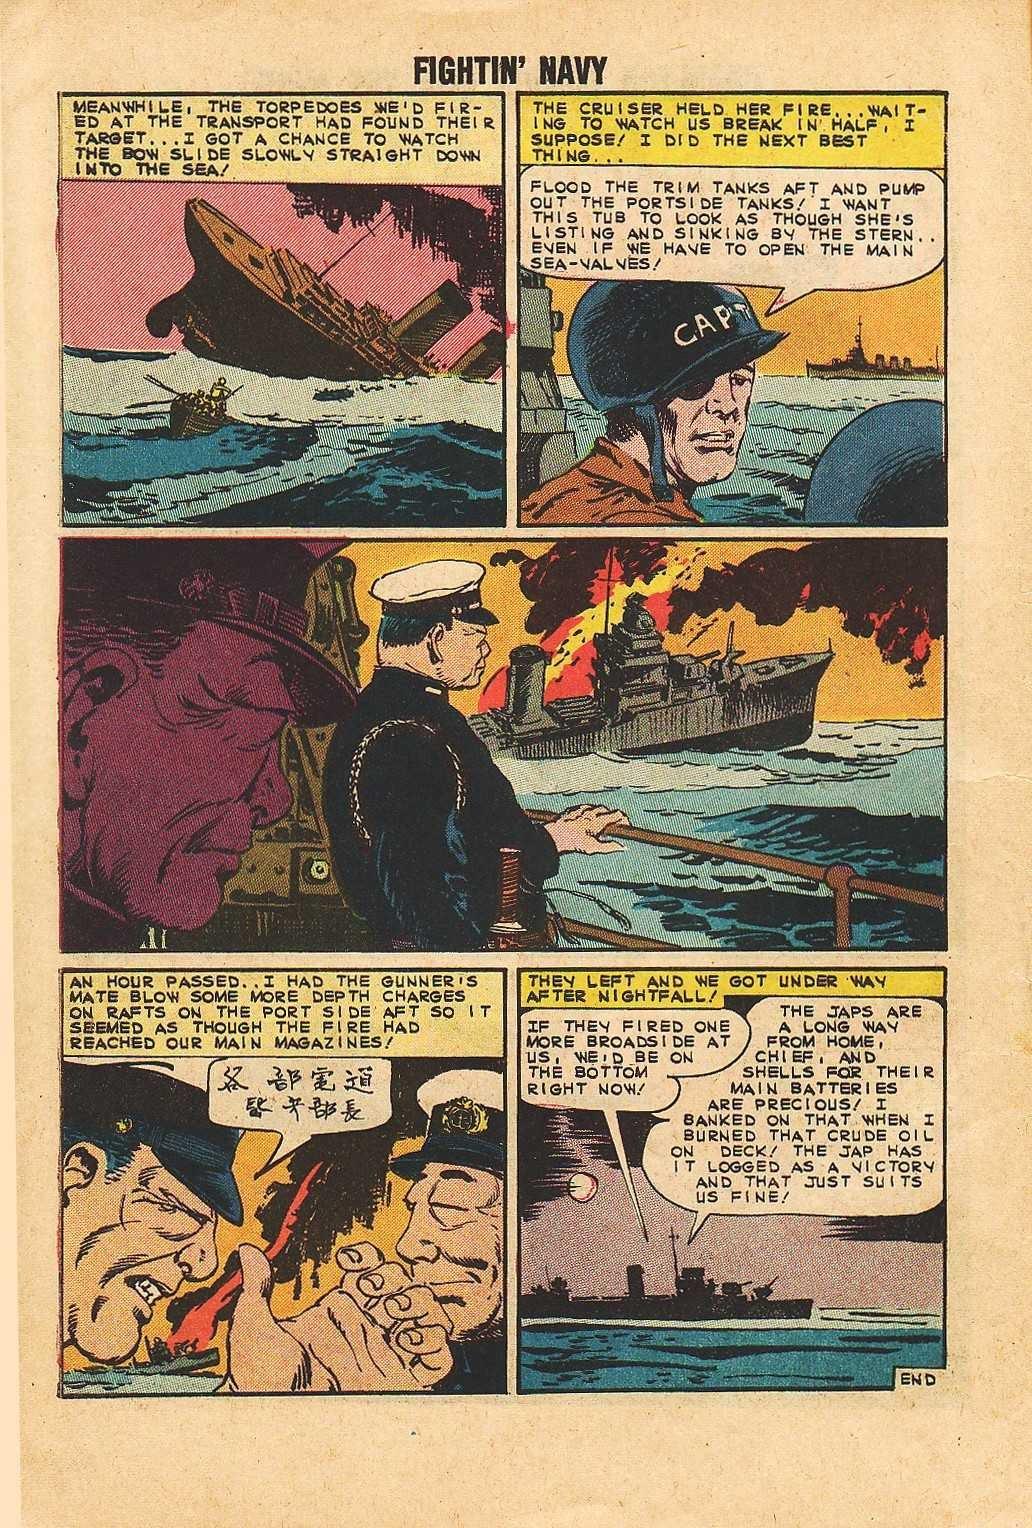 Read online Fightin' Navy comic -  Issue #113 - 10